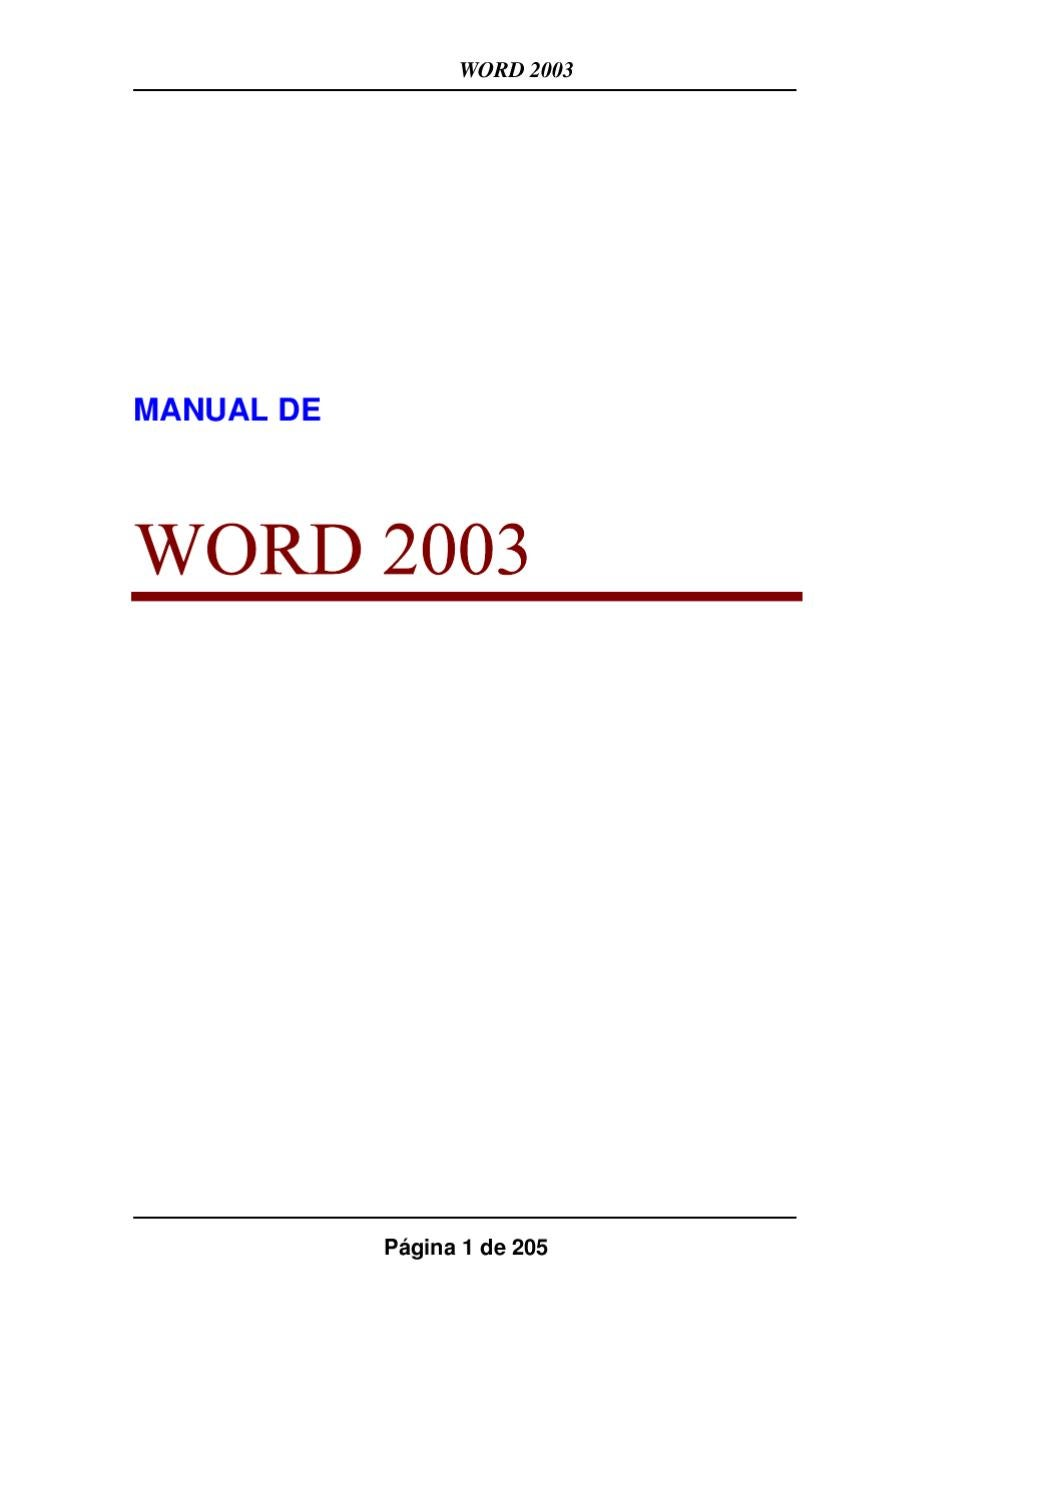 Manual Word 2003 by formacion axarquia - issuu